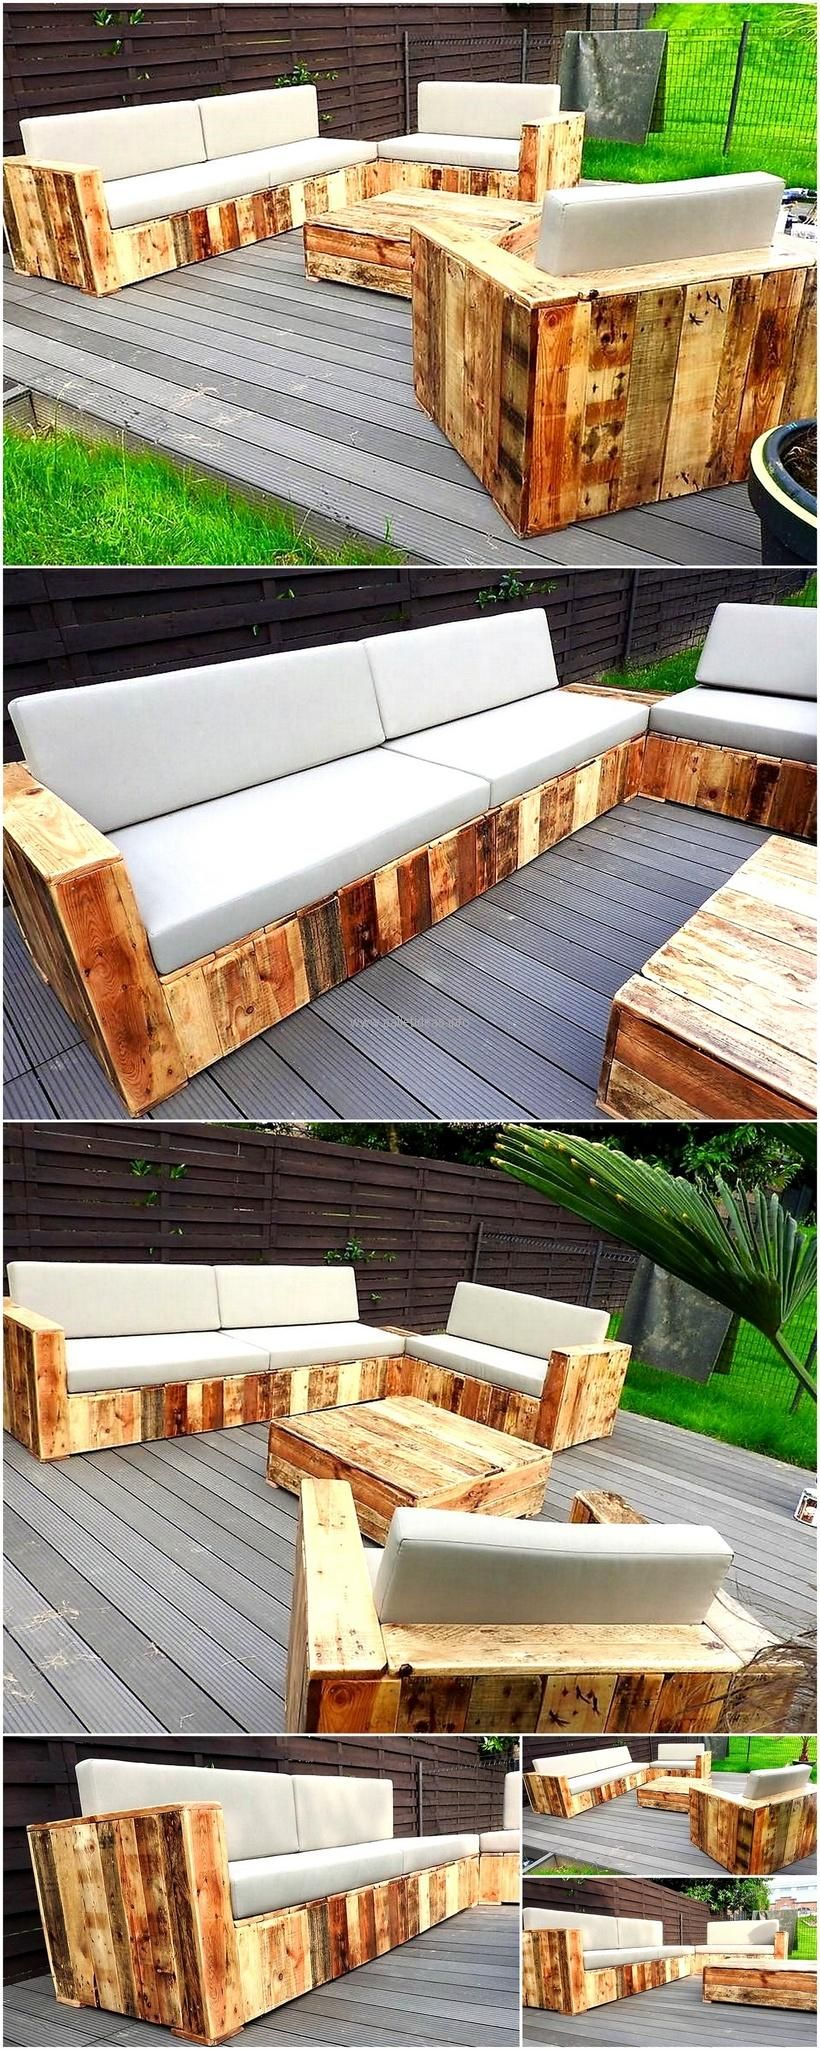 easy to make wood pallet furniture ideas - Easy Garden Furniture To Make